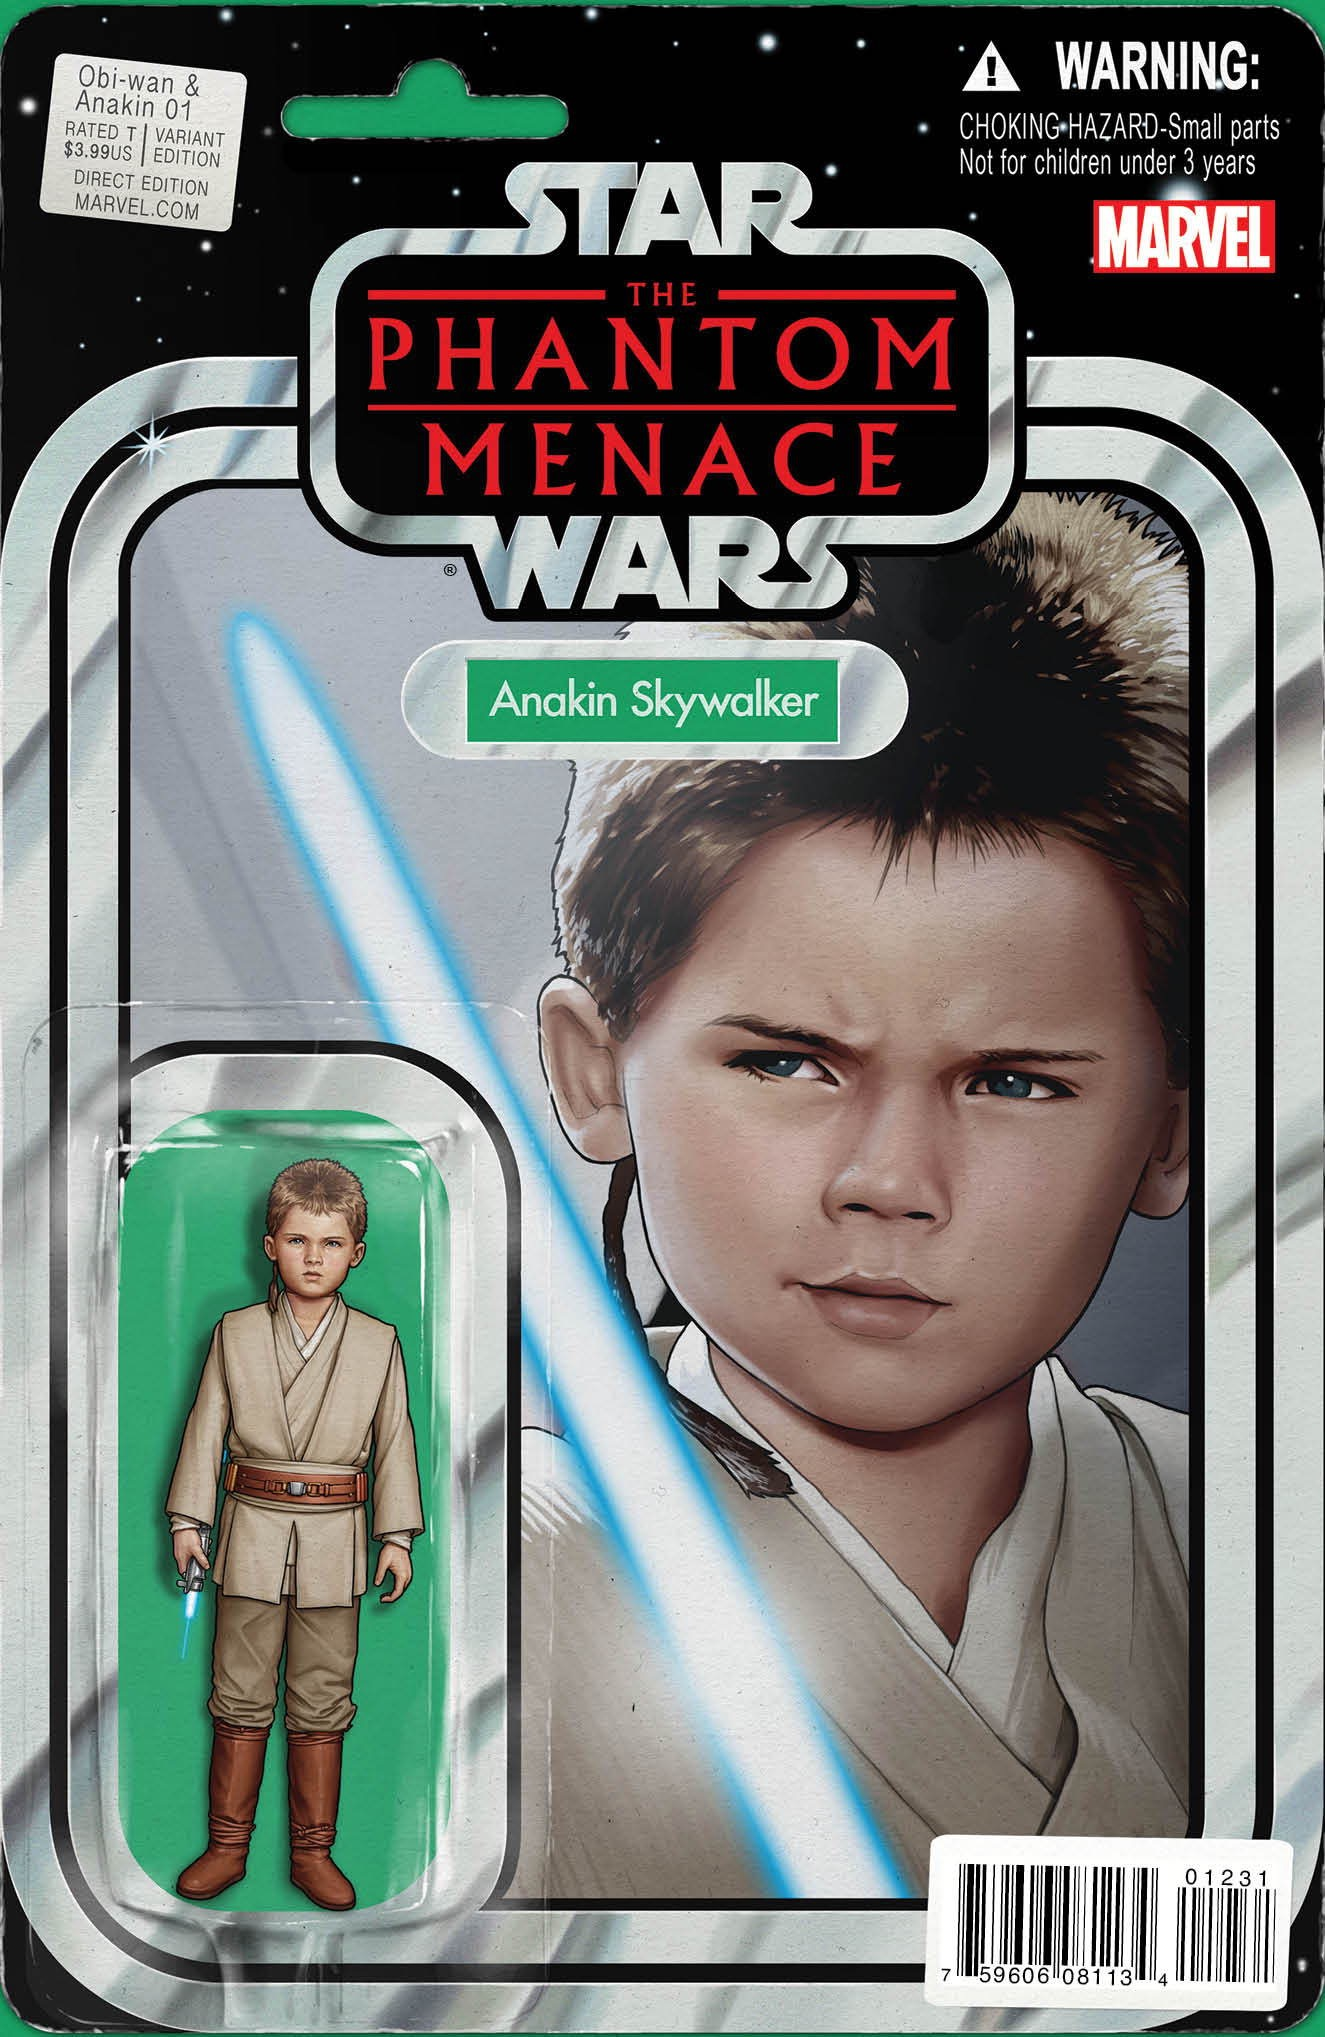 Obi-Wan_and_Anakin_Christopher_Action_Figure_Variant.jpg